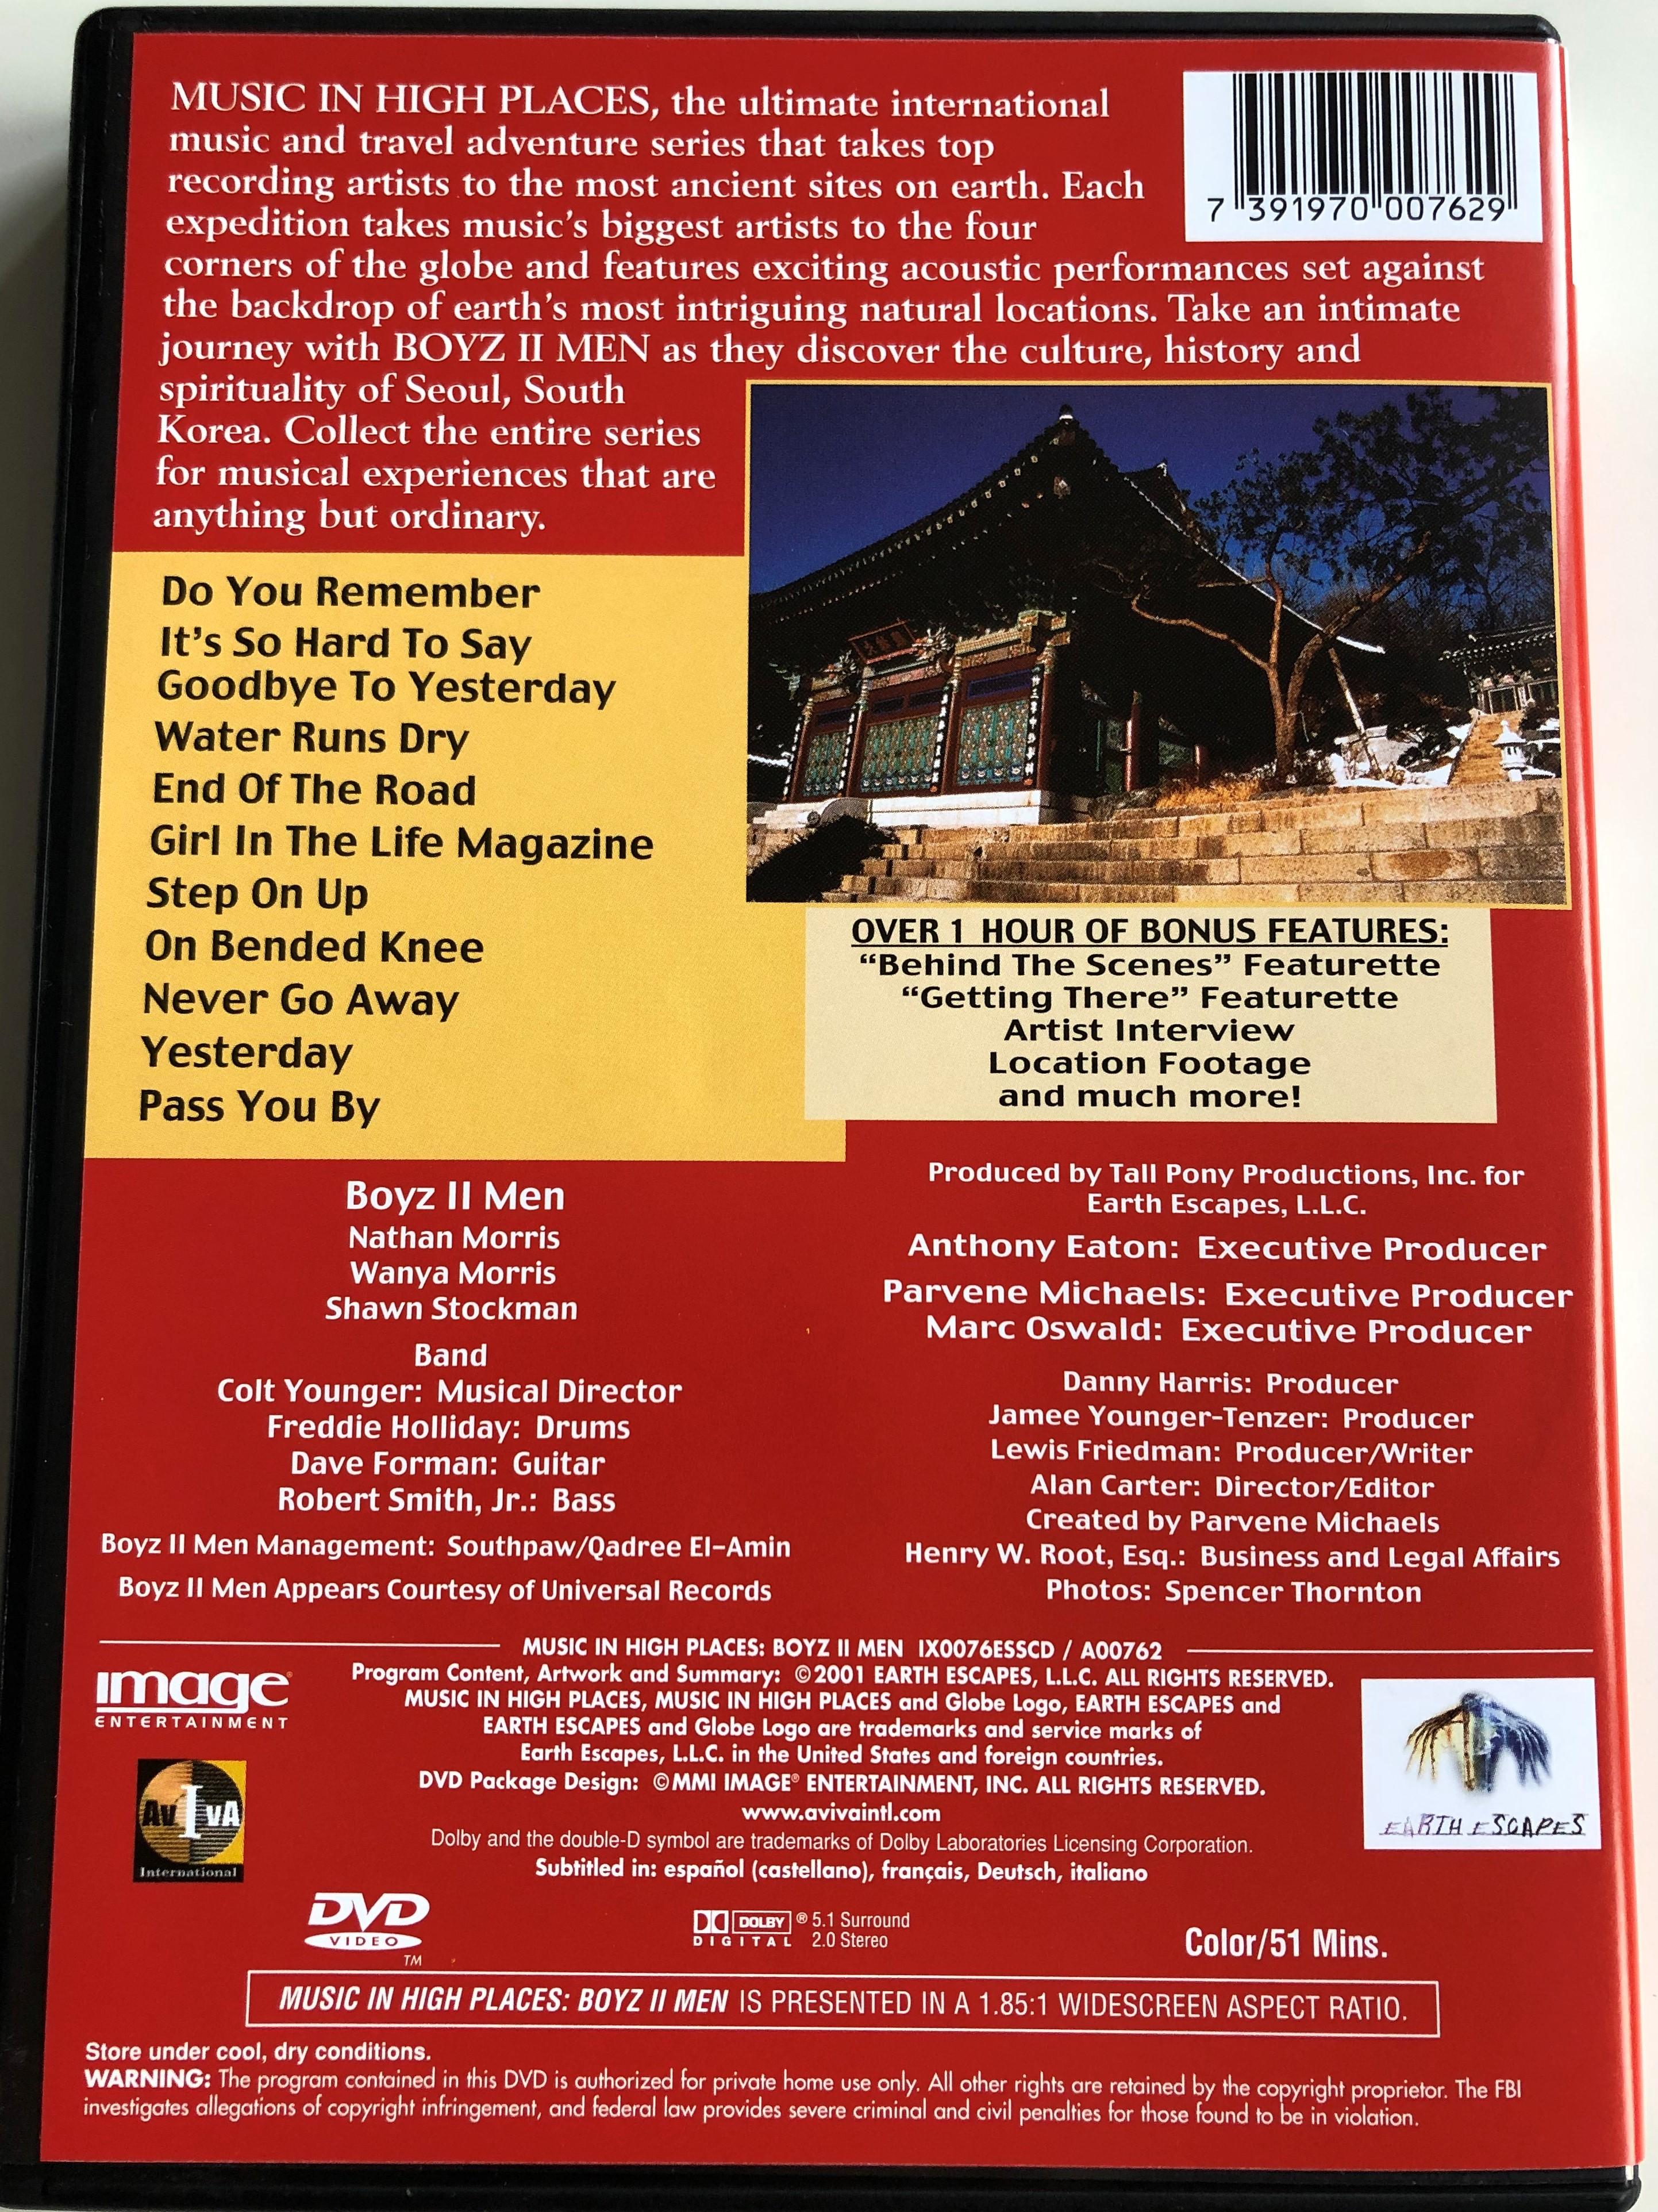 boyz-ii-men-dvd-2001-music-in-high-places-directed-by-alan-carter-3.jpg